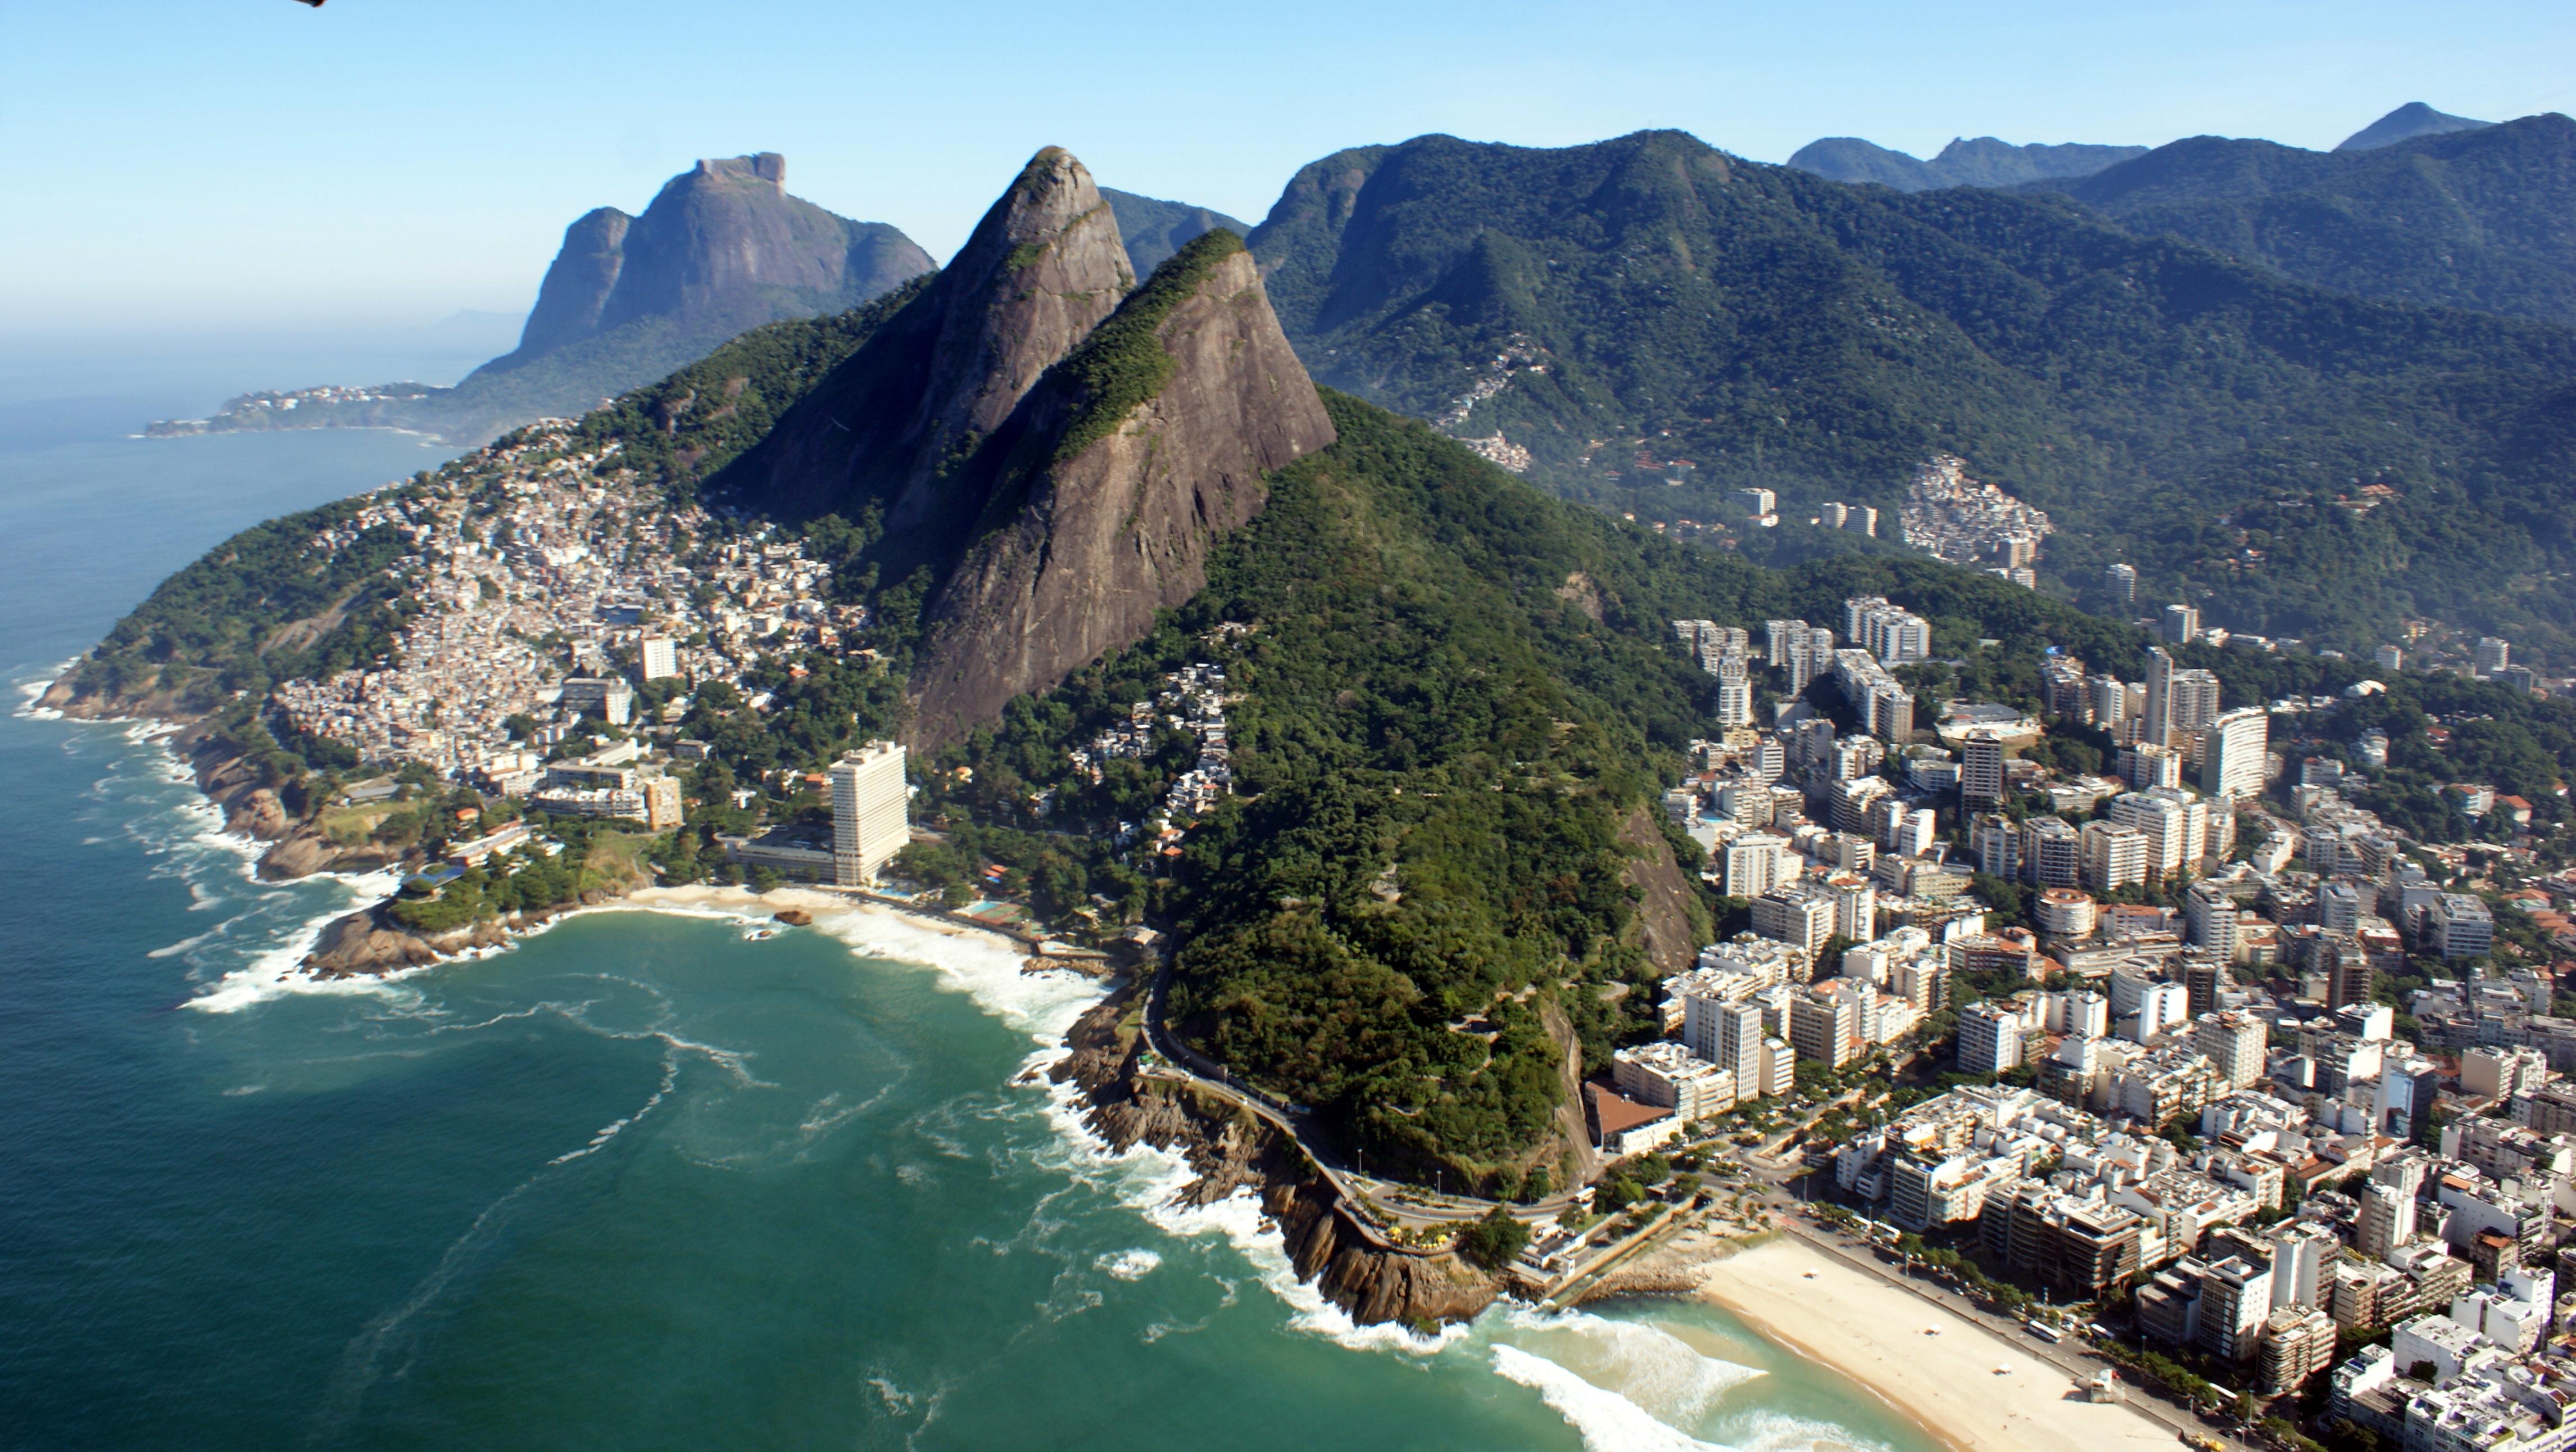 Rio de Janeiro - 4584x2583